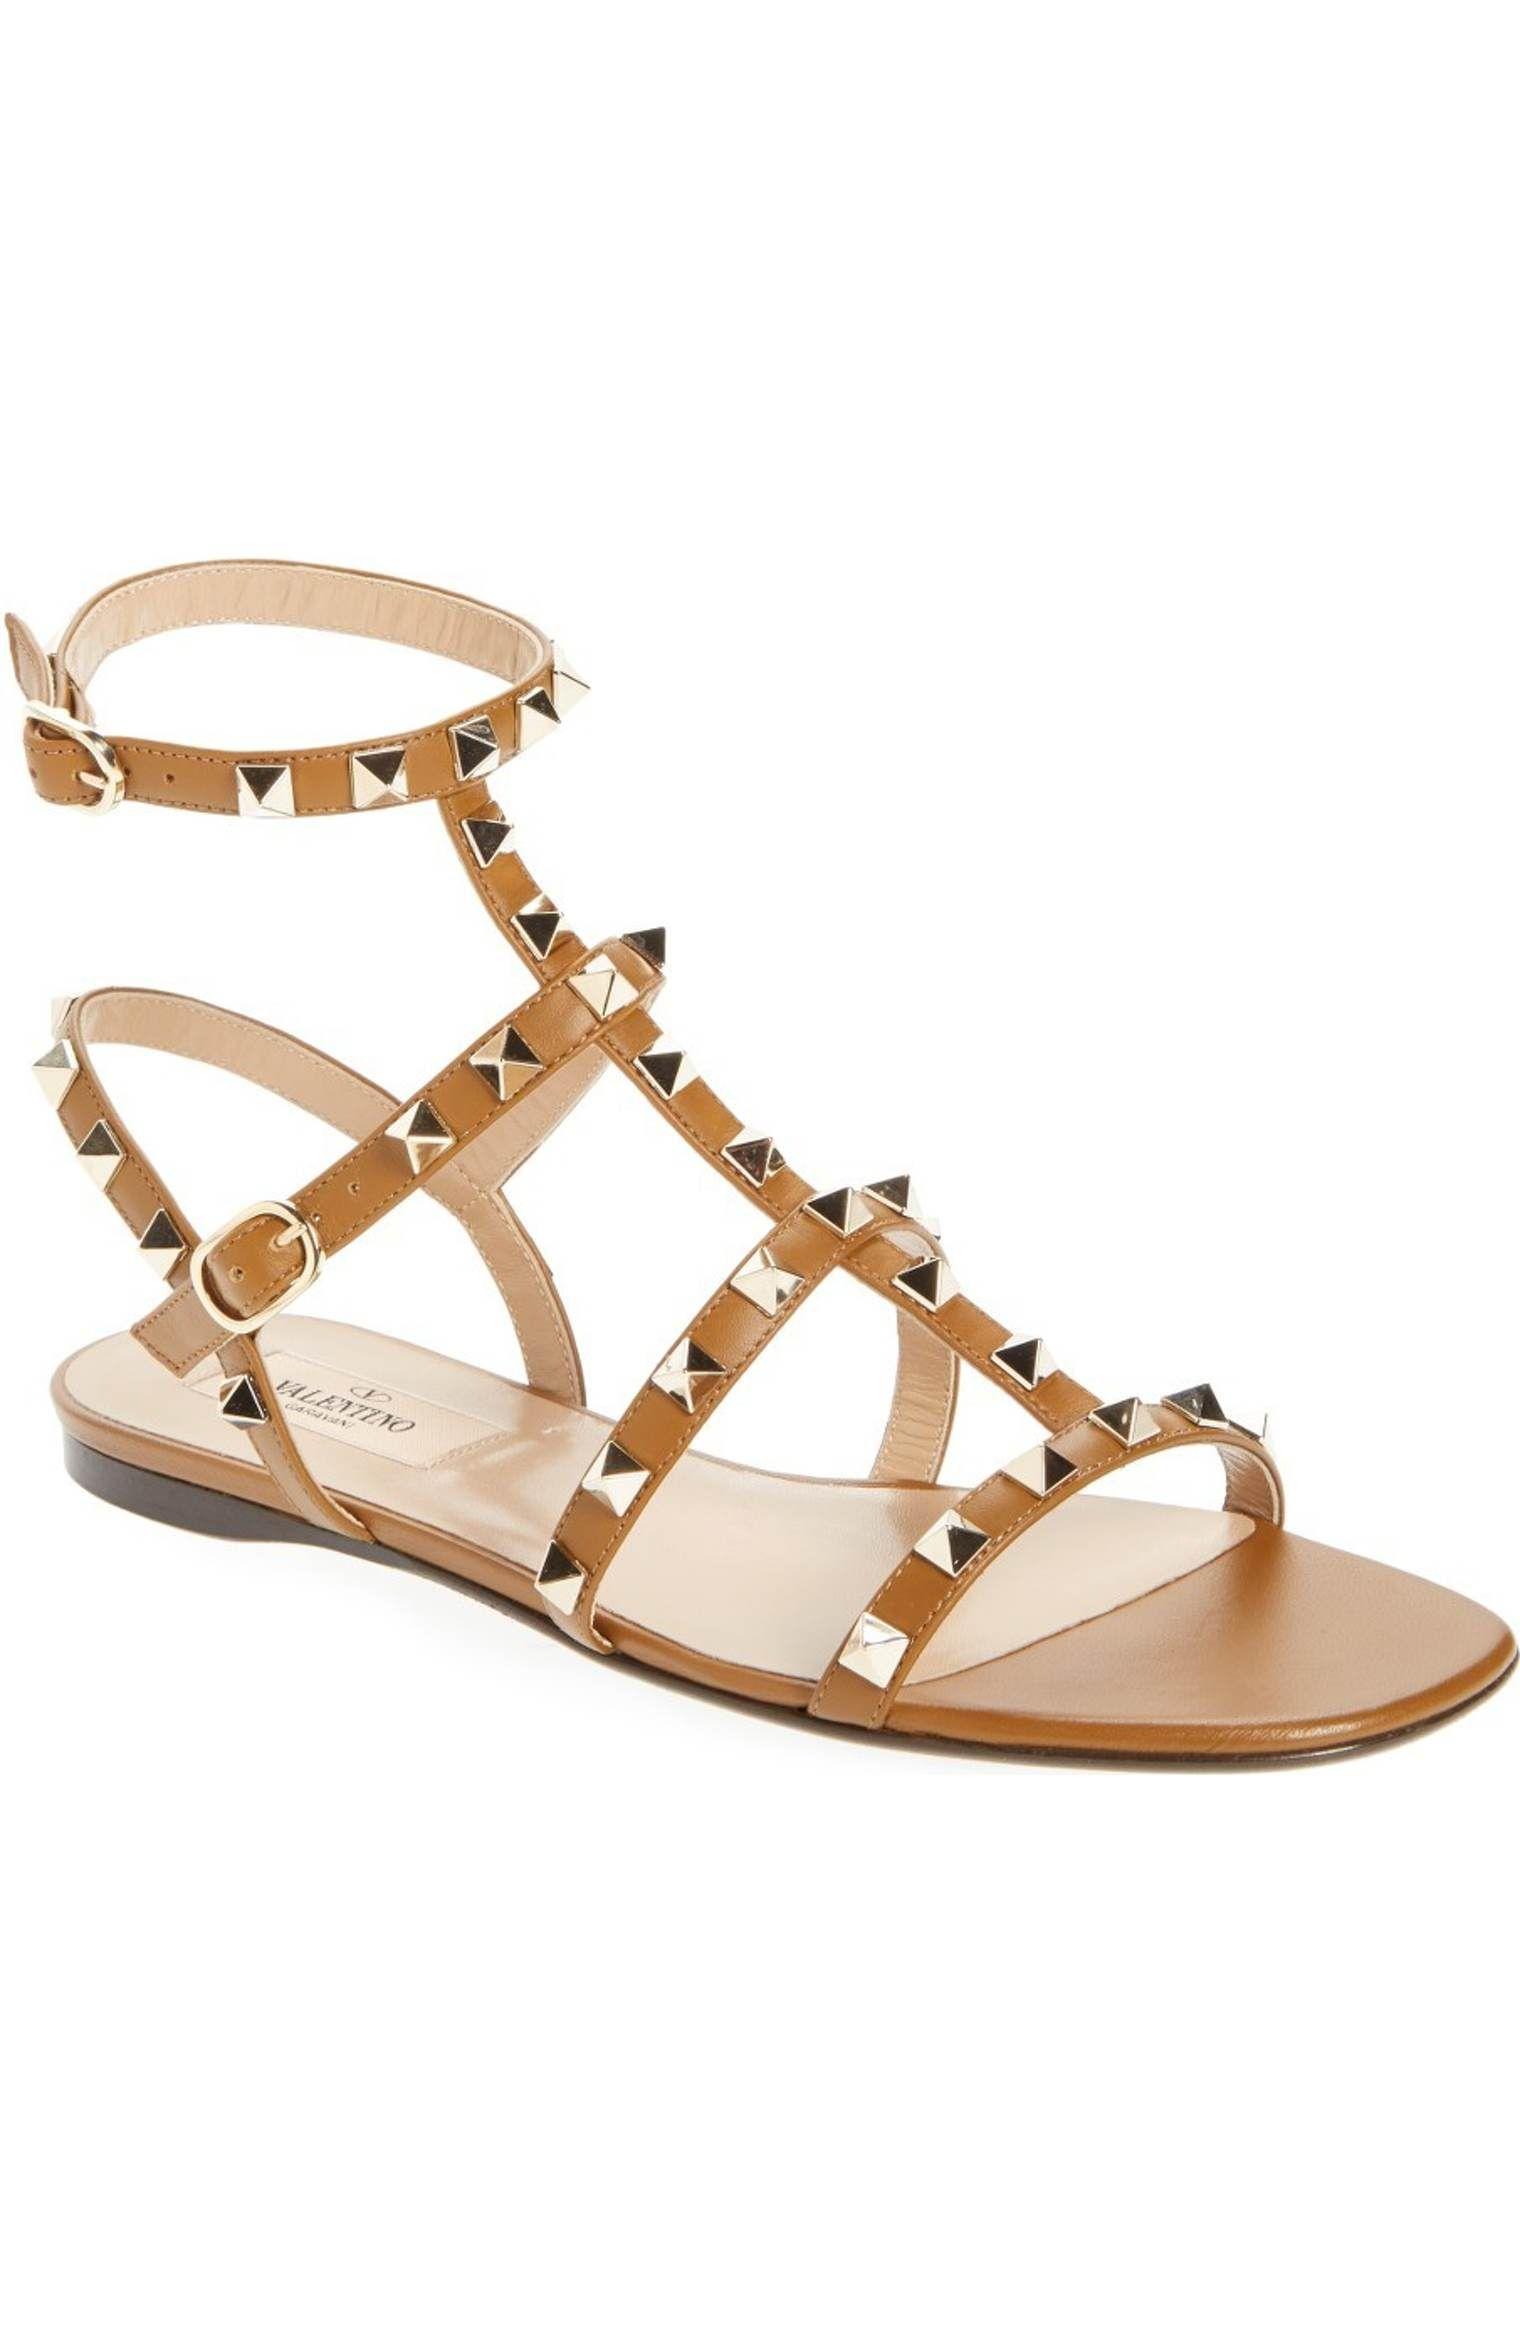 9d55f595b Main Image - Valentino Rockstud Gladiator Sandal (Women)